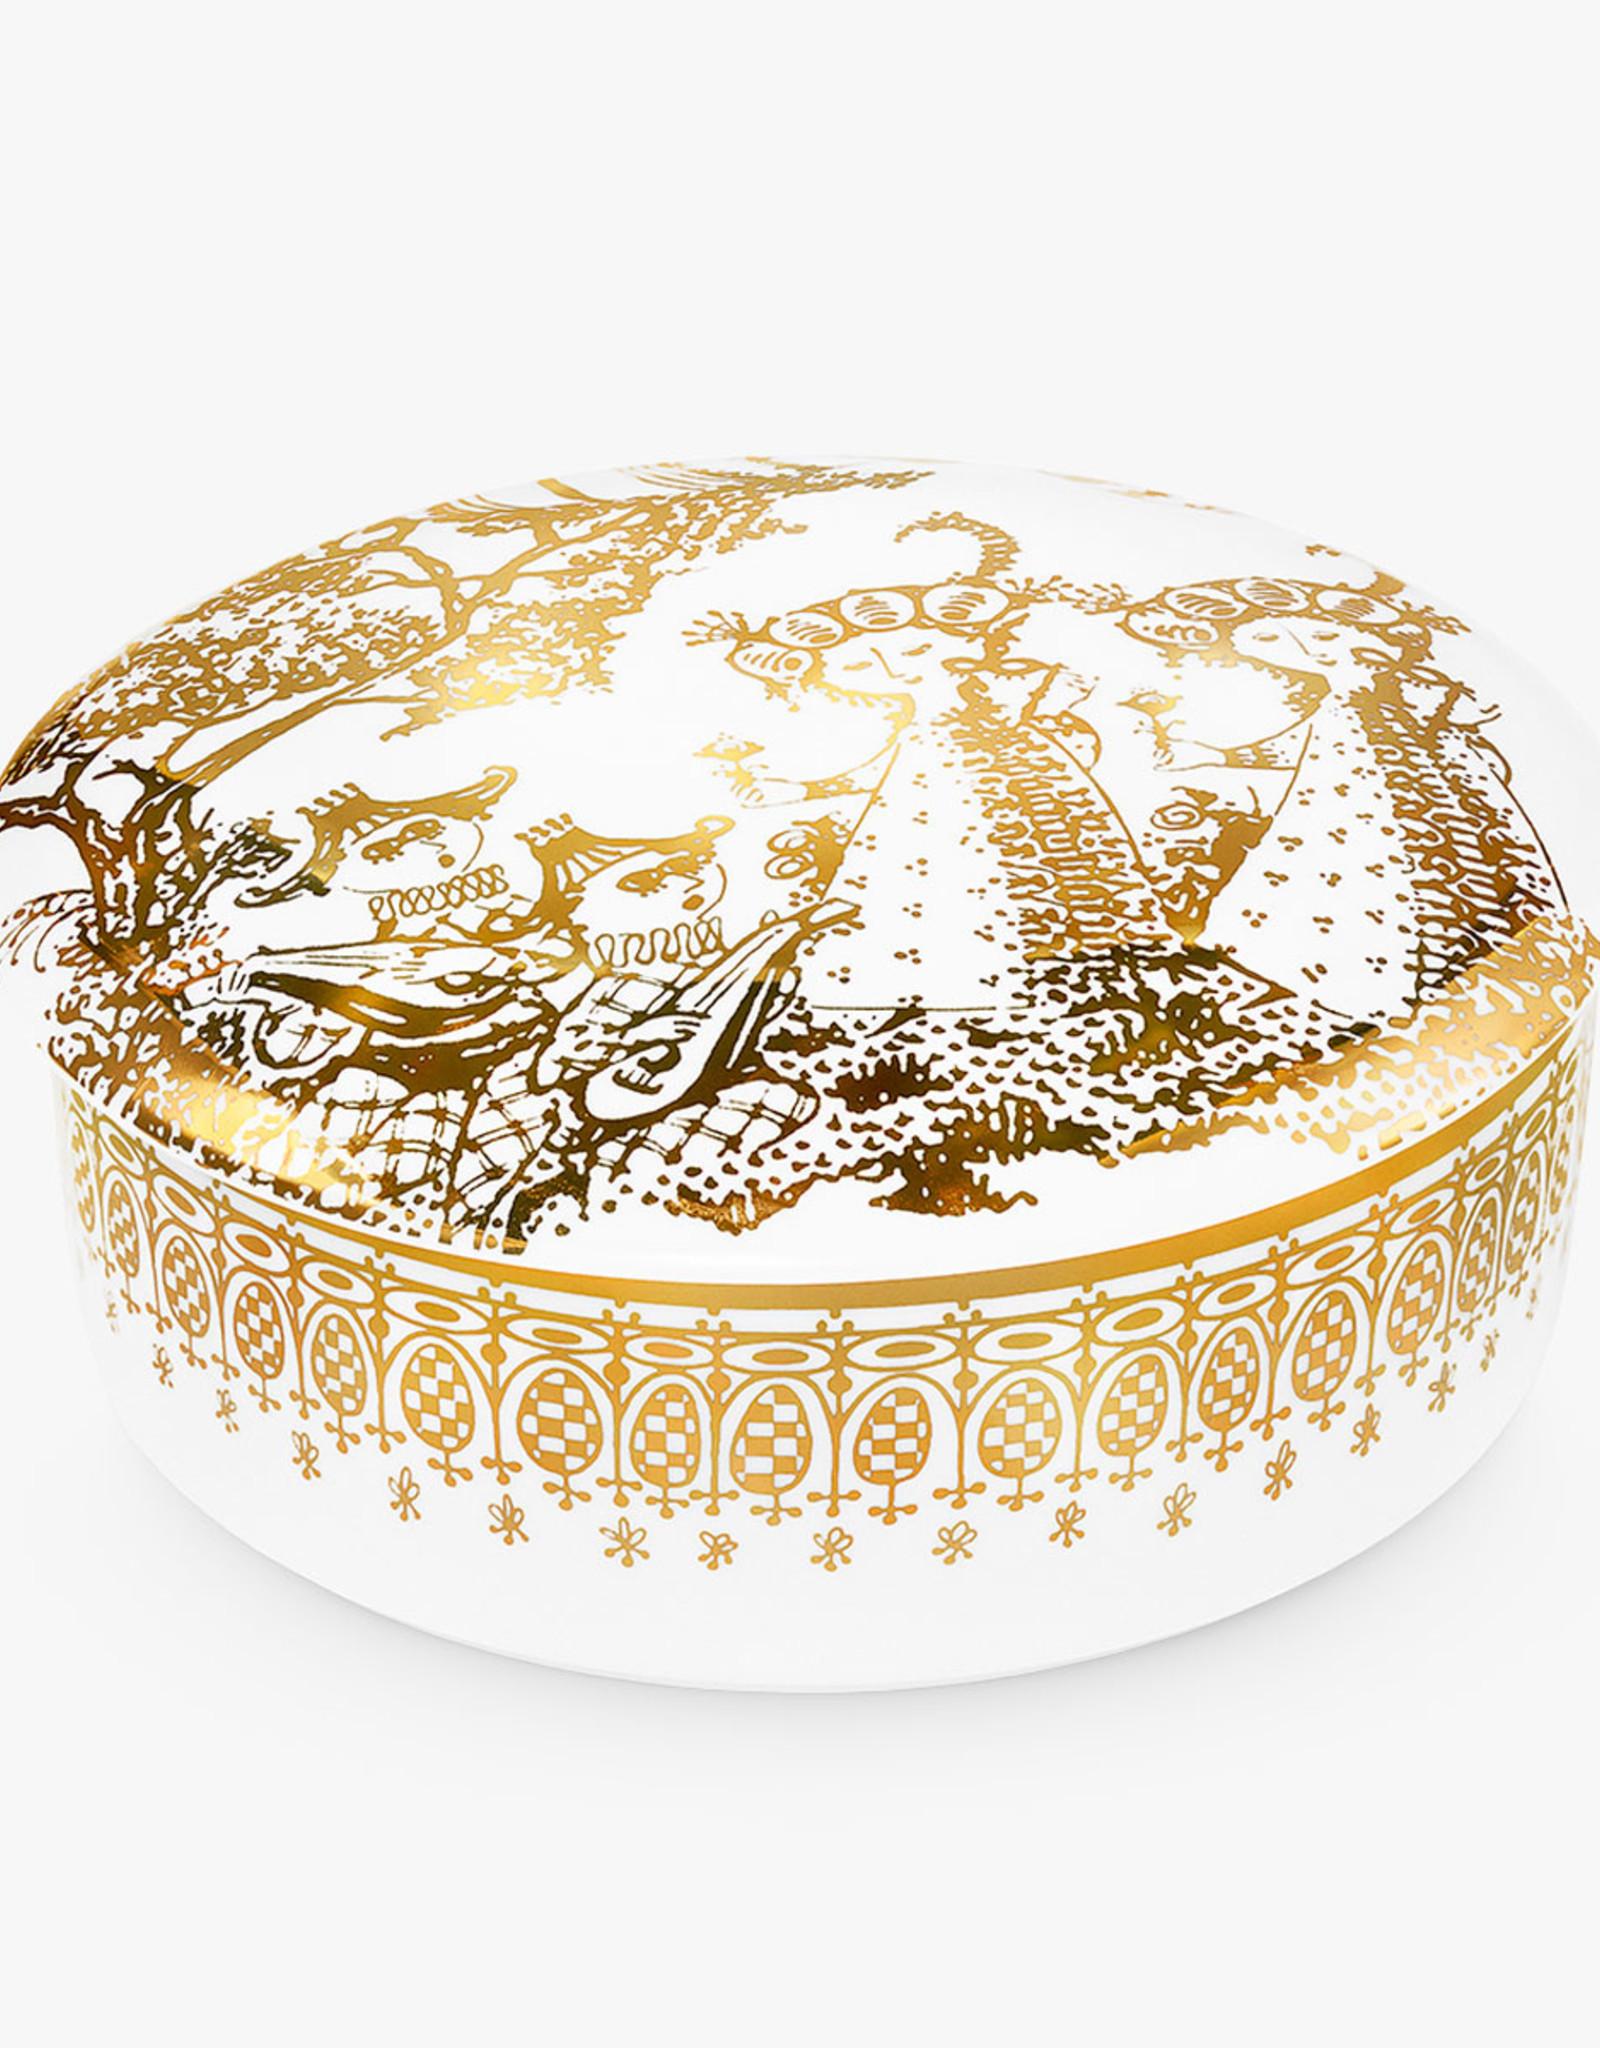 Bonbonniere Mascarade jar by Bjorn Wiinblad | Porcelain | Gold | 160mm